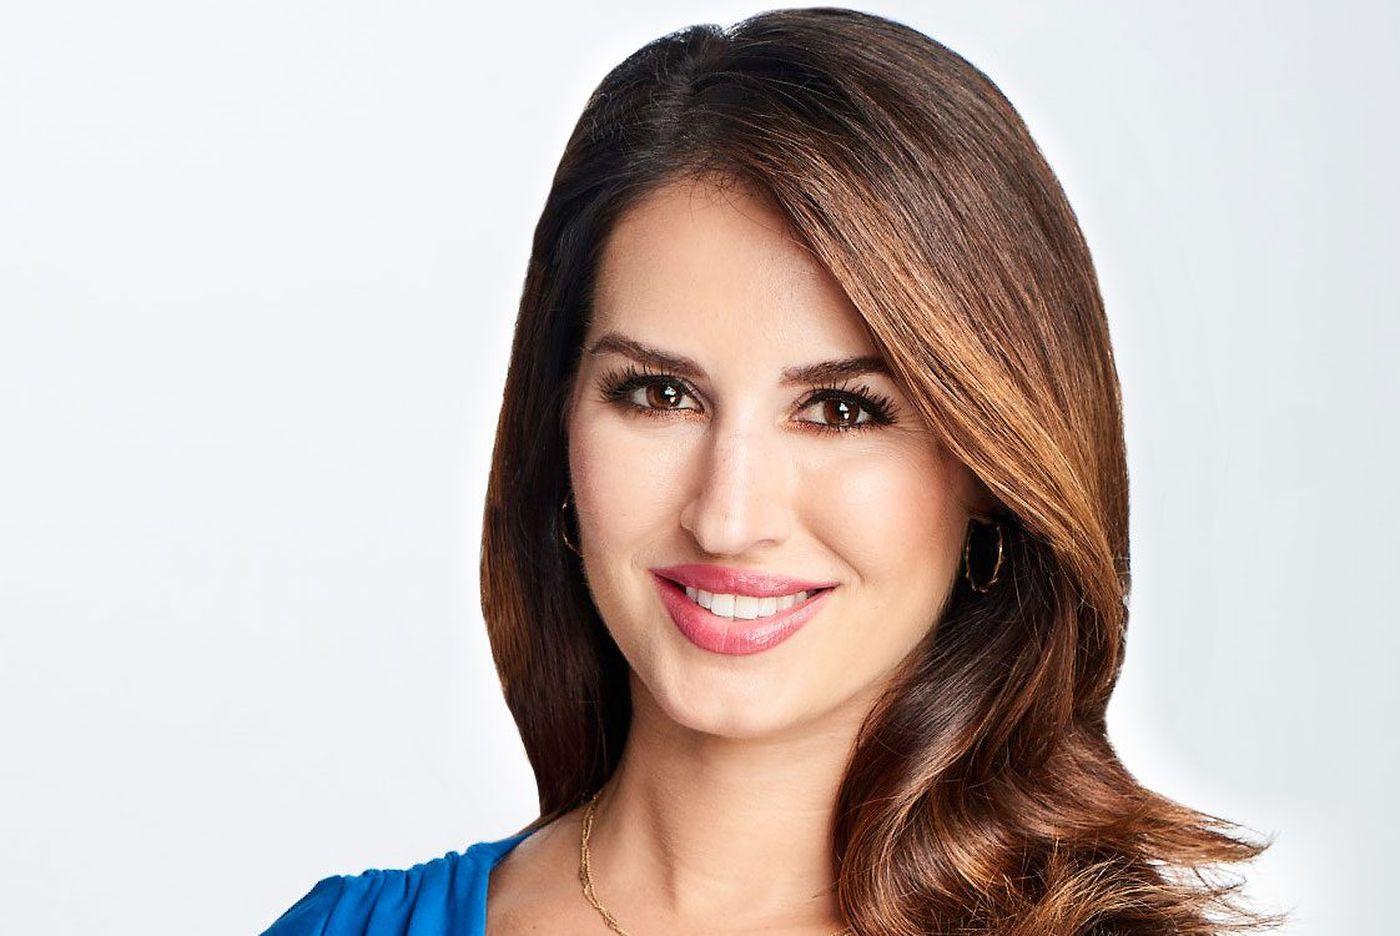 Former NBC10 meteorologist Sheena Parveen leaves Washington, DC gig for San Diego station